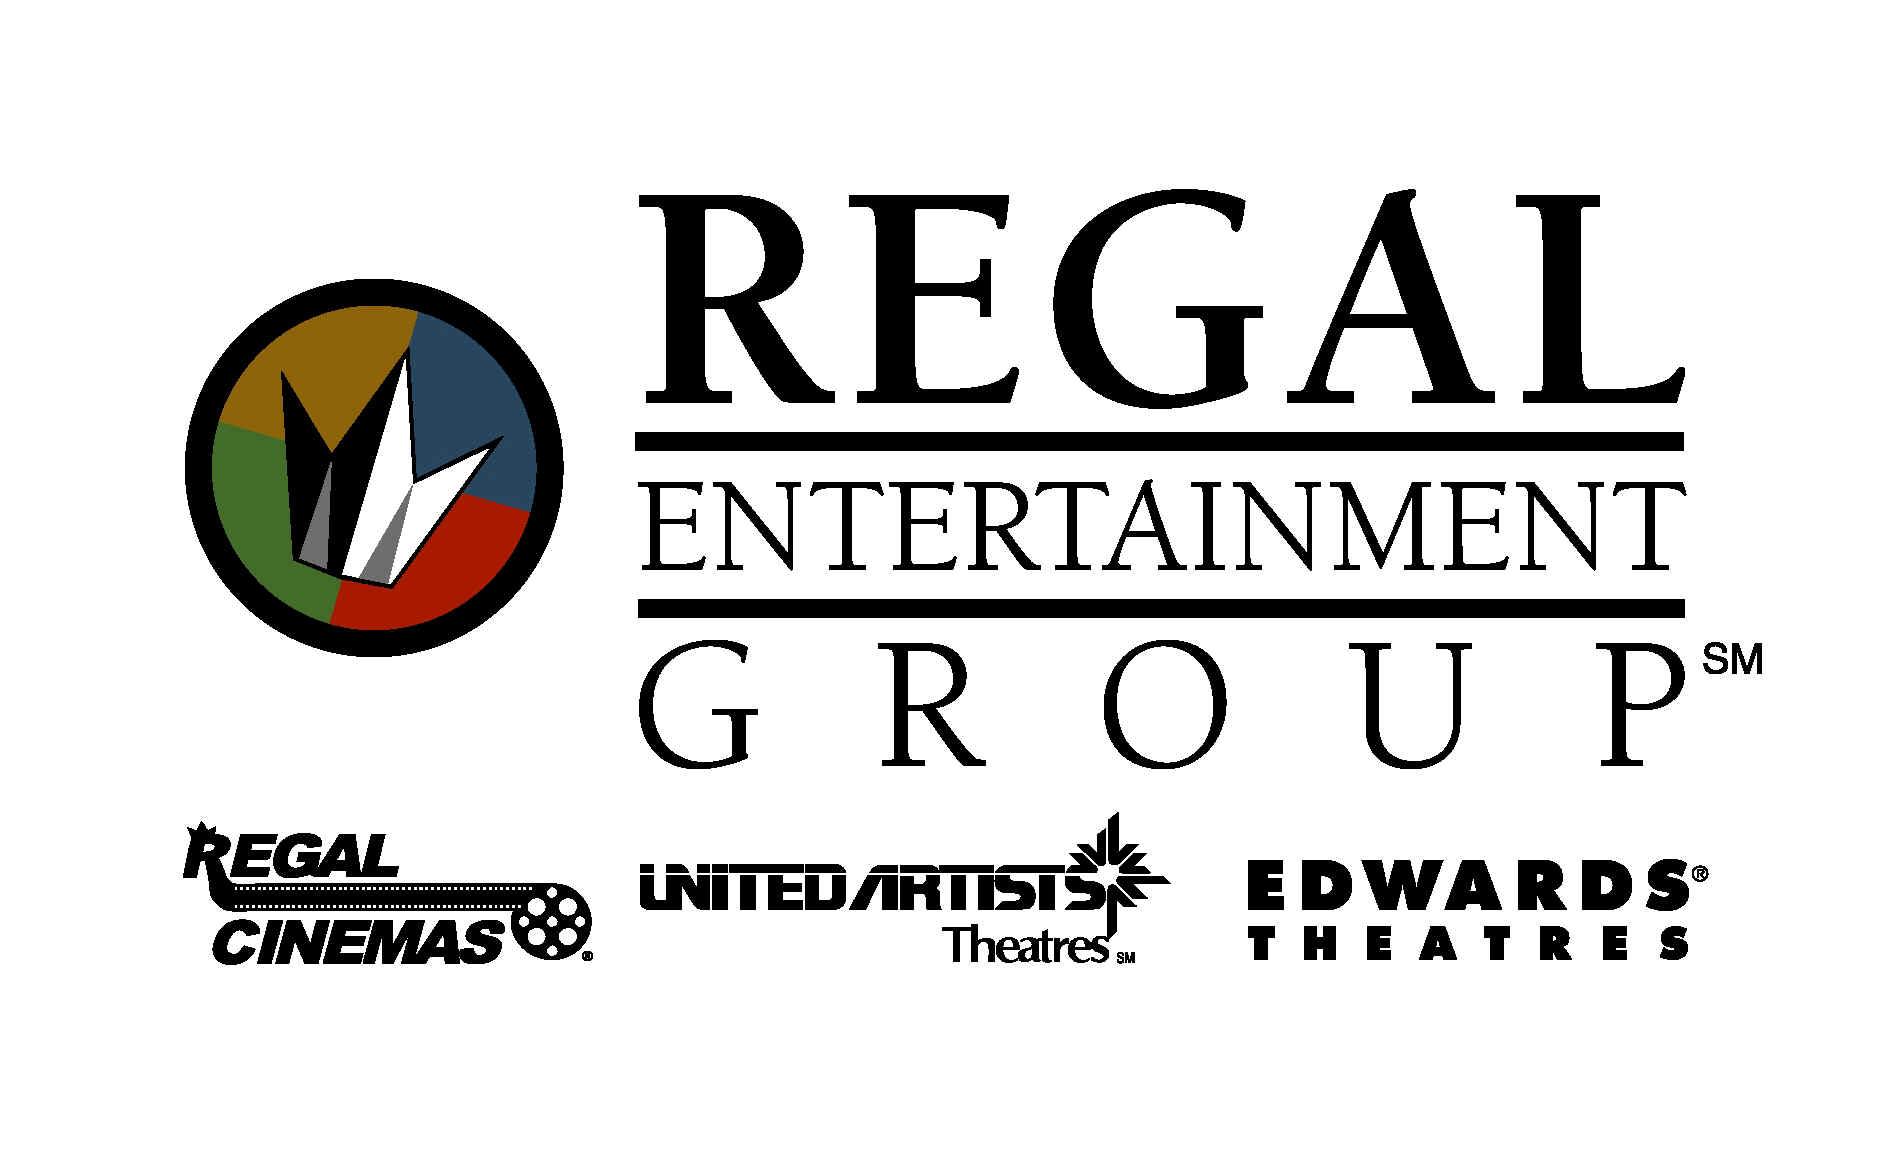 Regal Entertainment Group Announces Plan To Increase